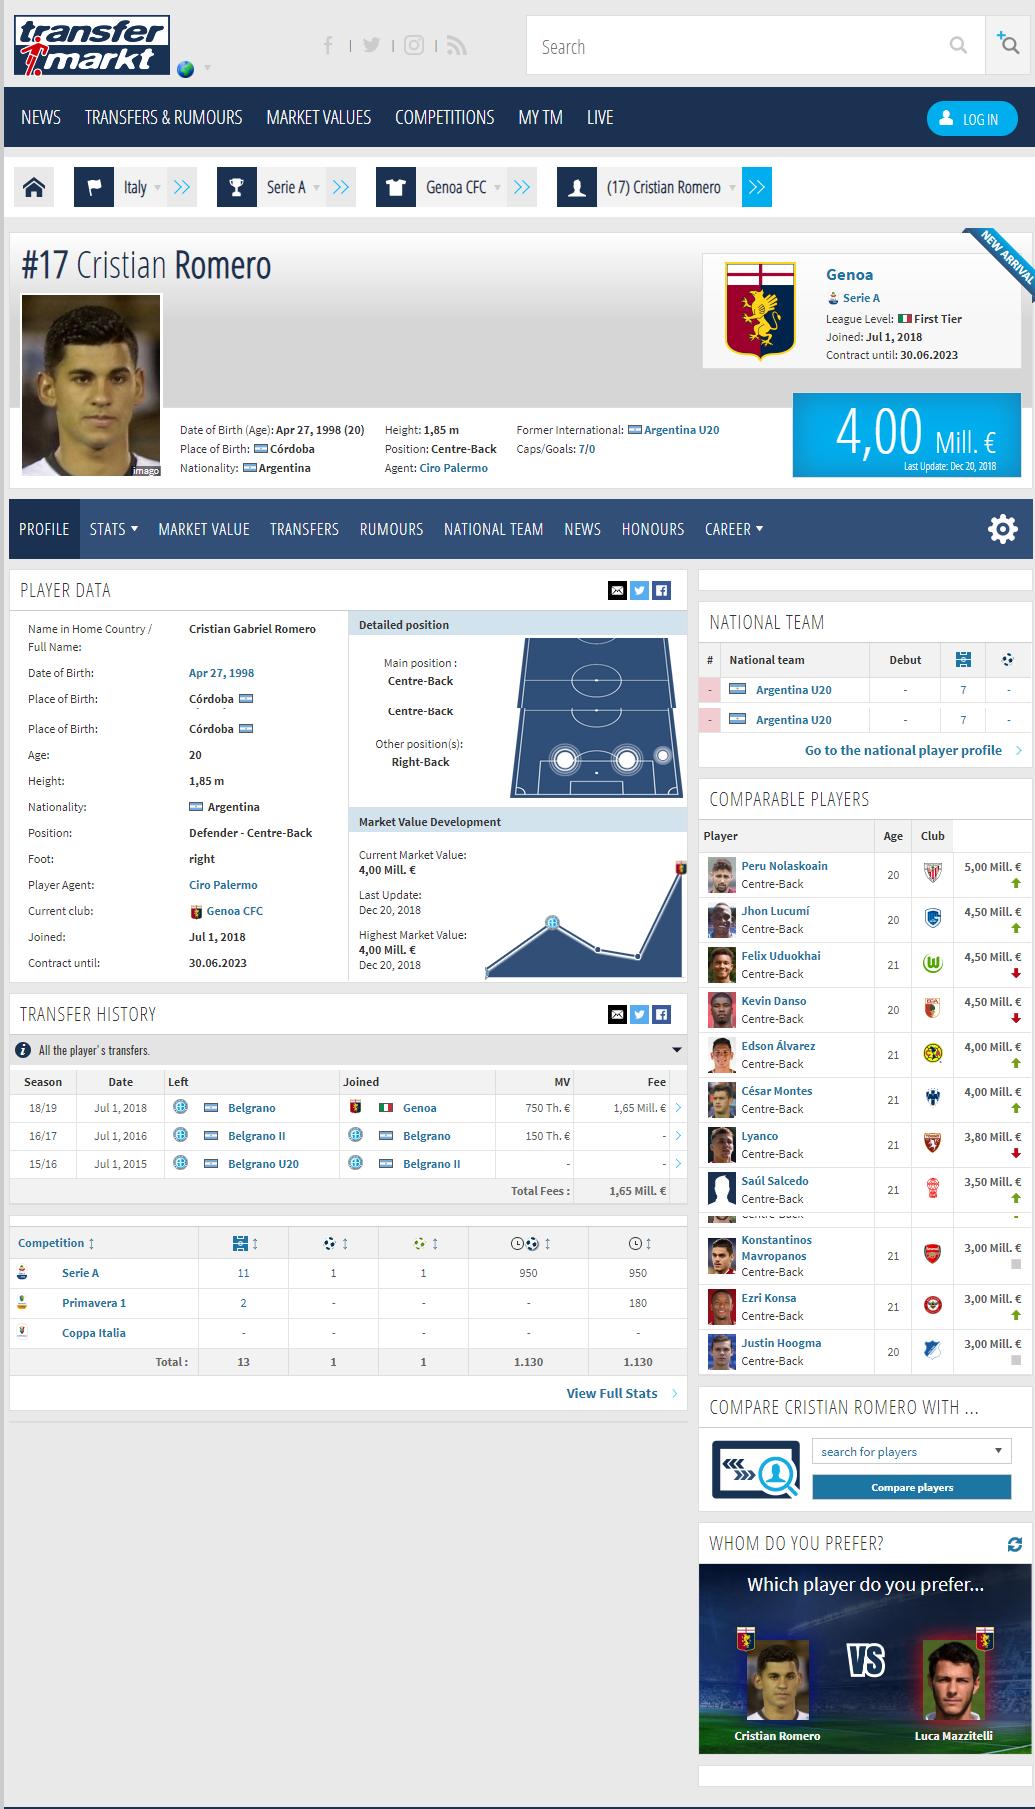 screencapture-transfermarkt-cristian-romero-profil-spieler-35591.png